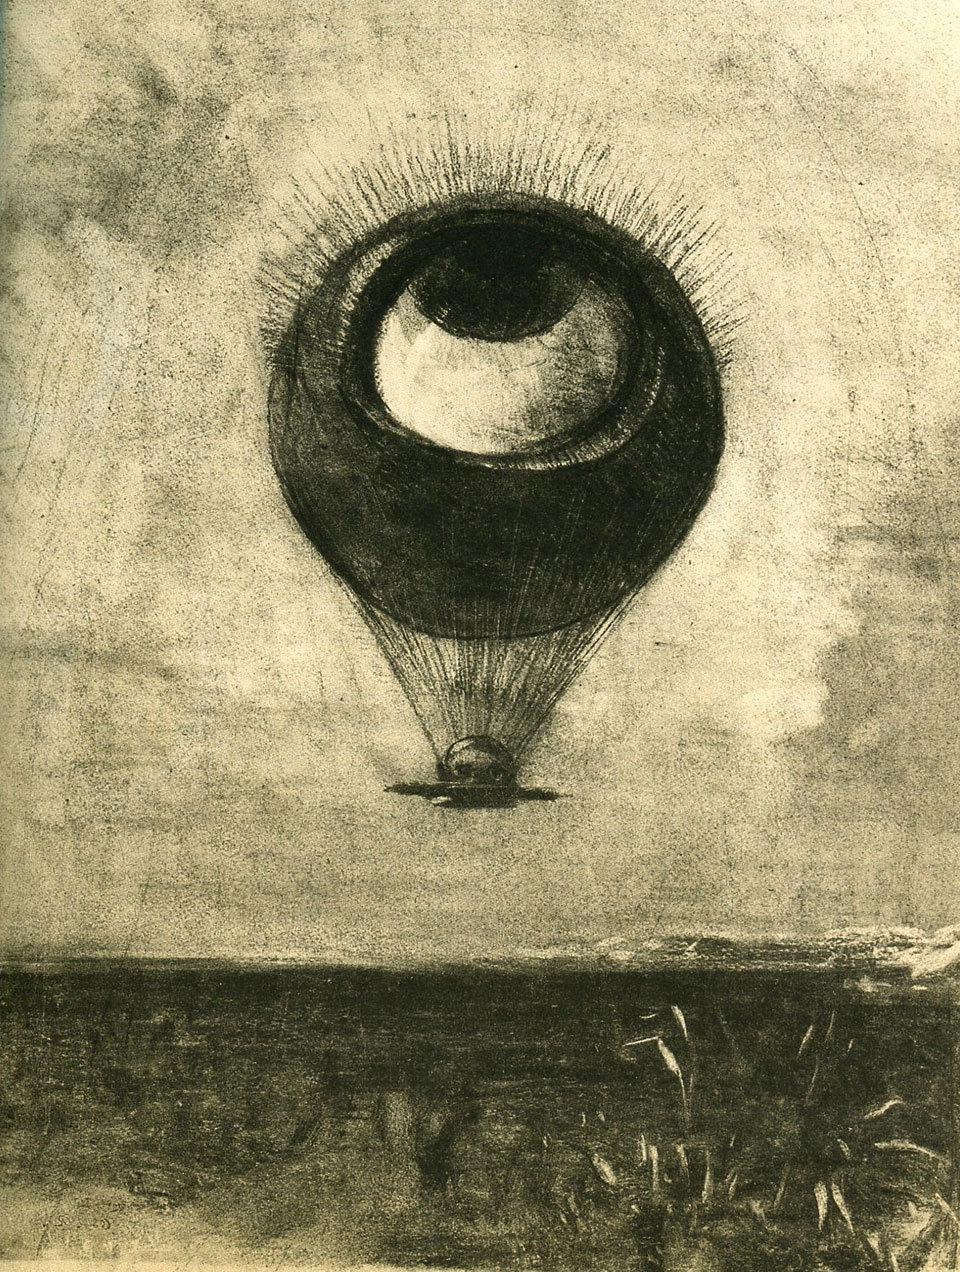 Воздушный шароглаз